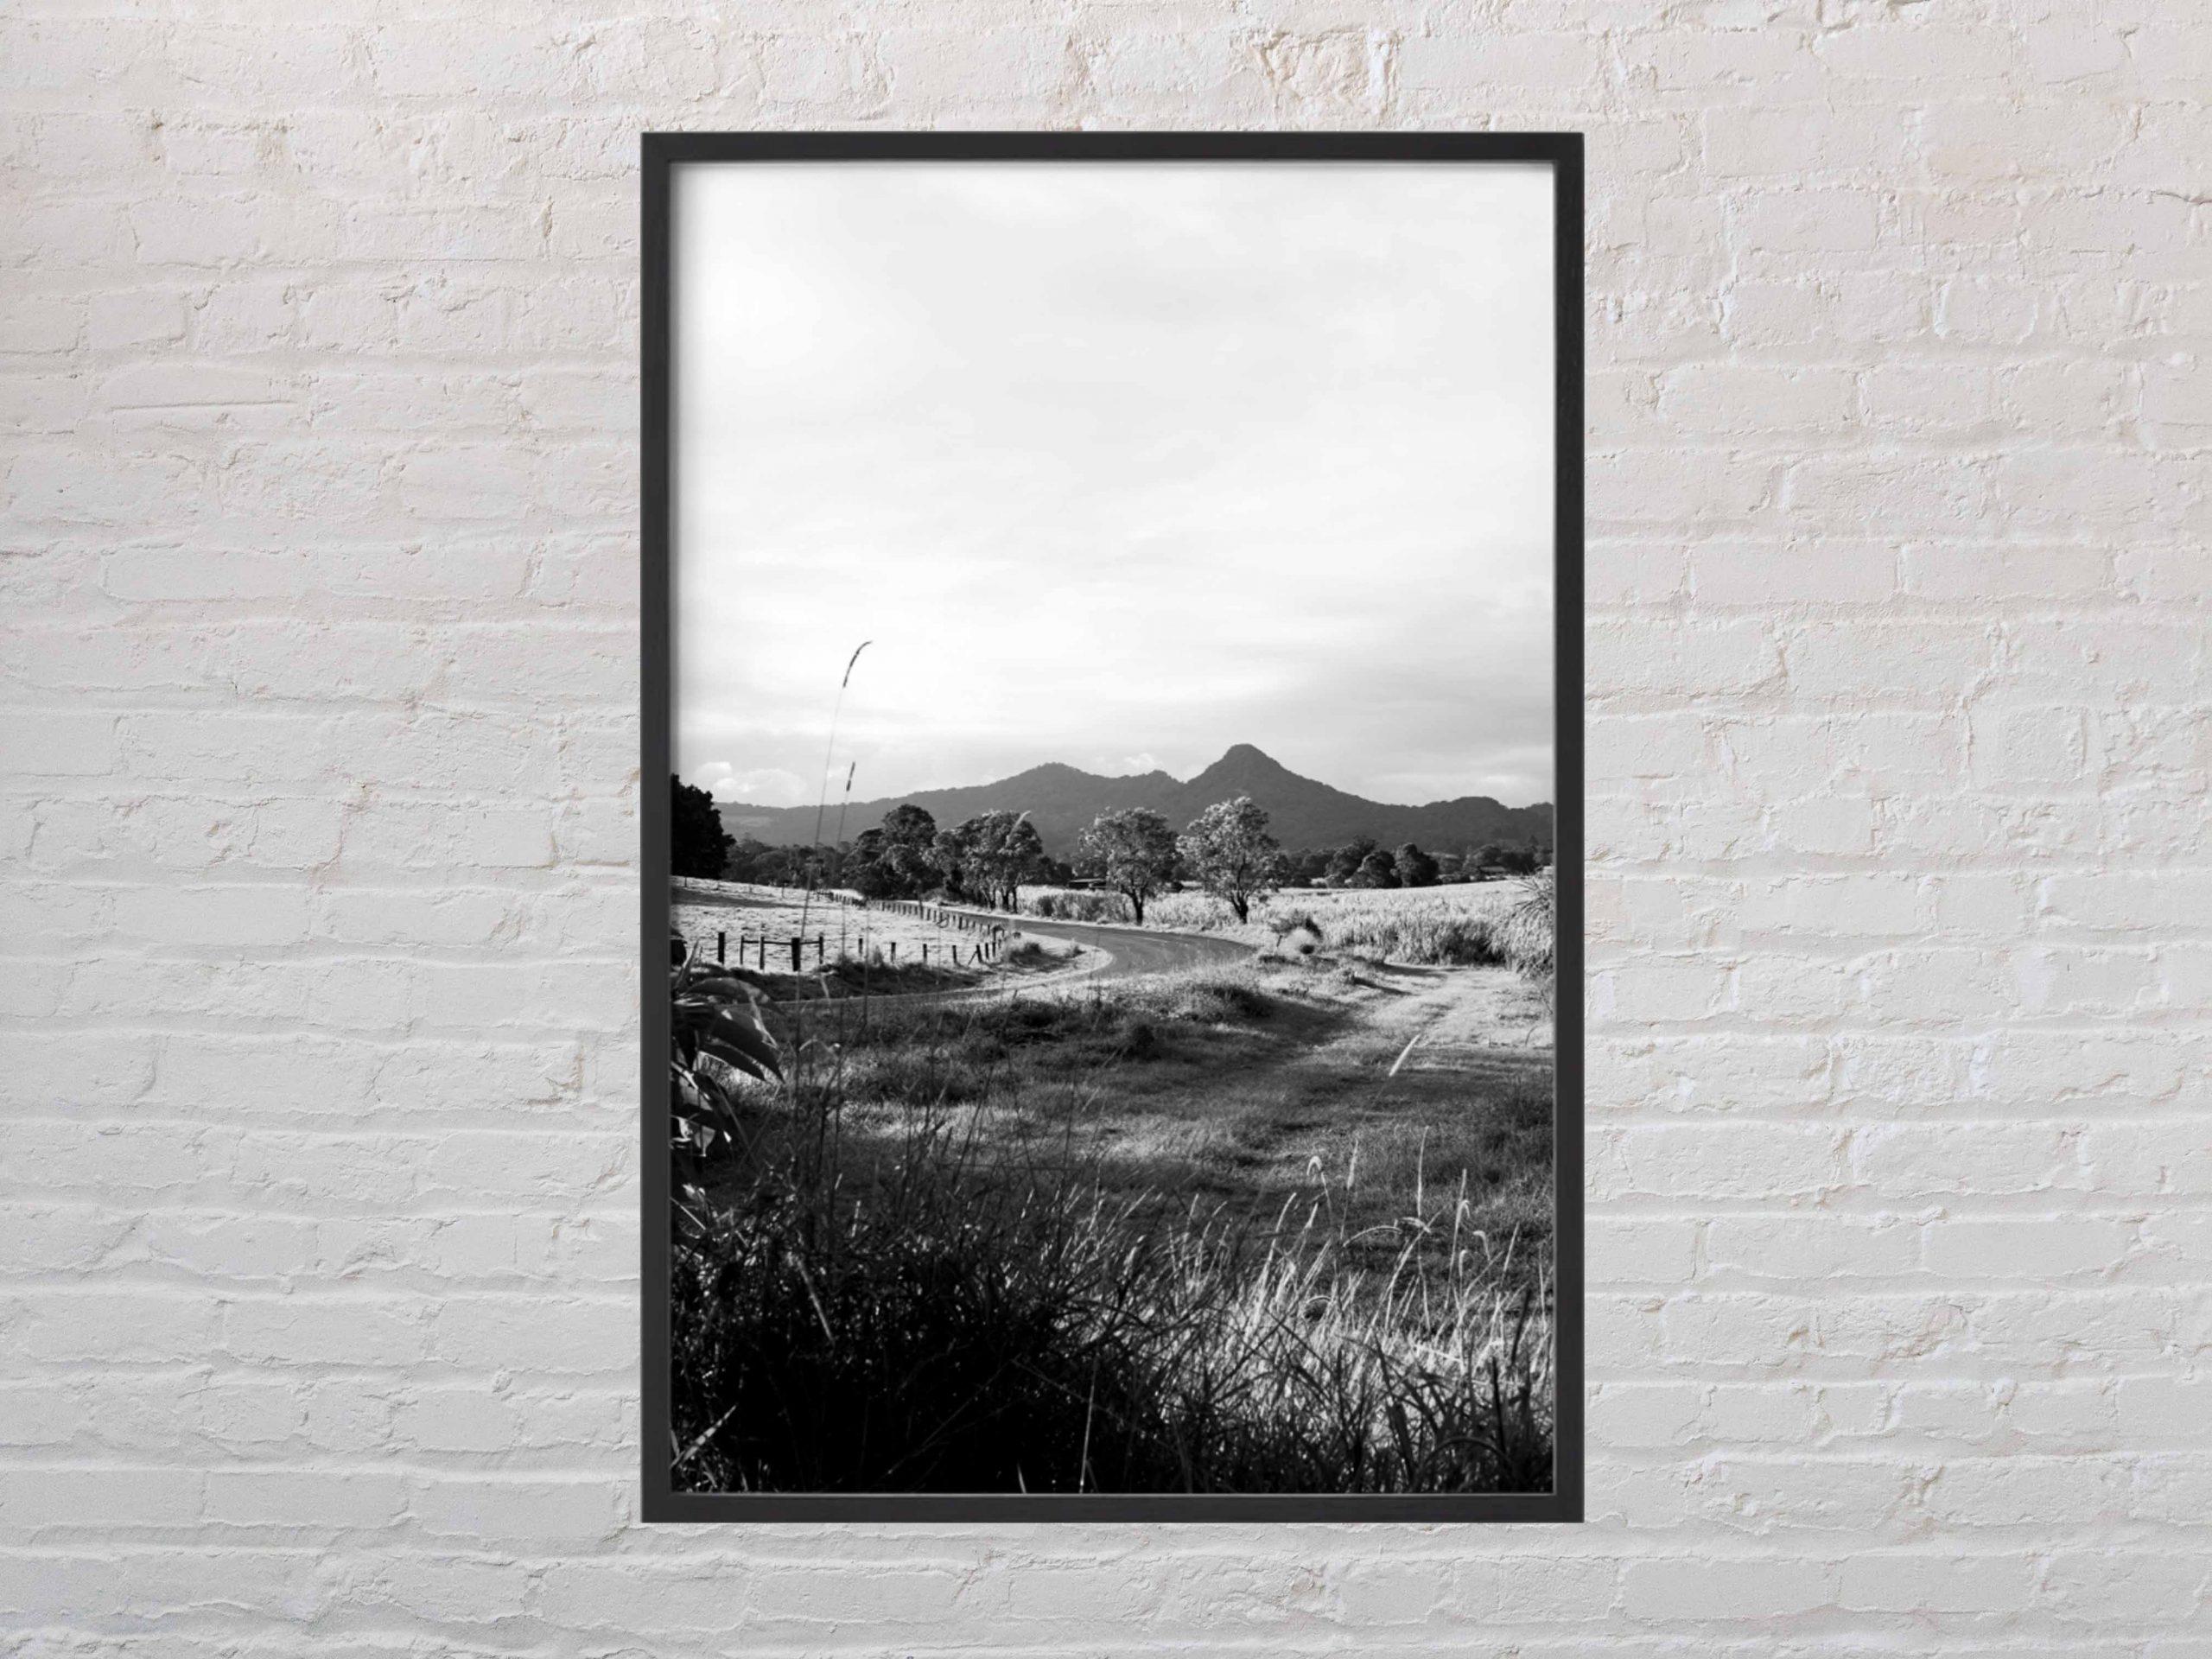 'Apex' shown with black frame. Mount Chincogan, Mullumbimby, NSW, Australia